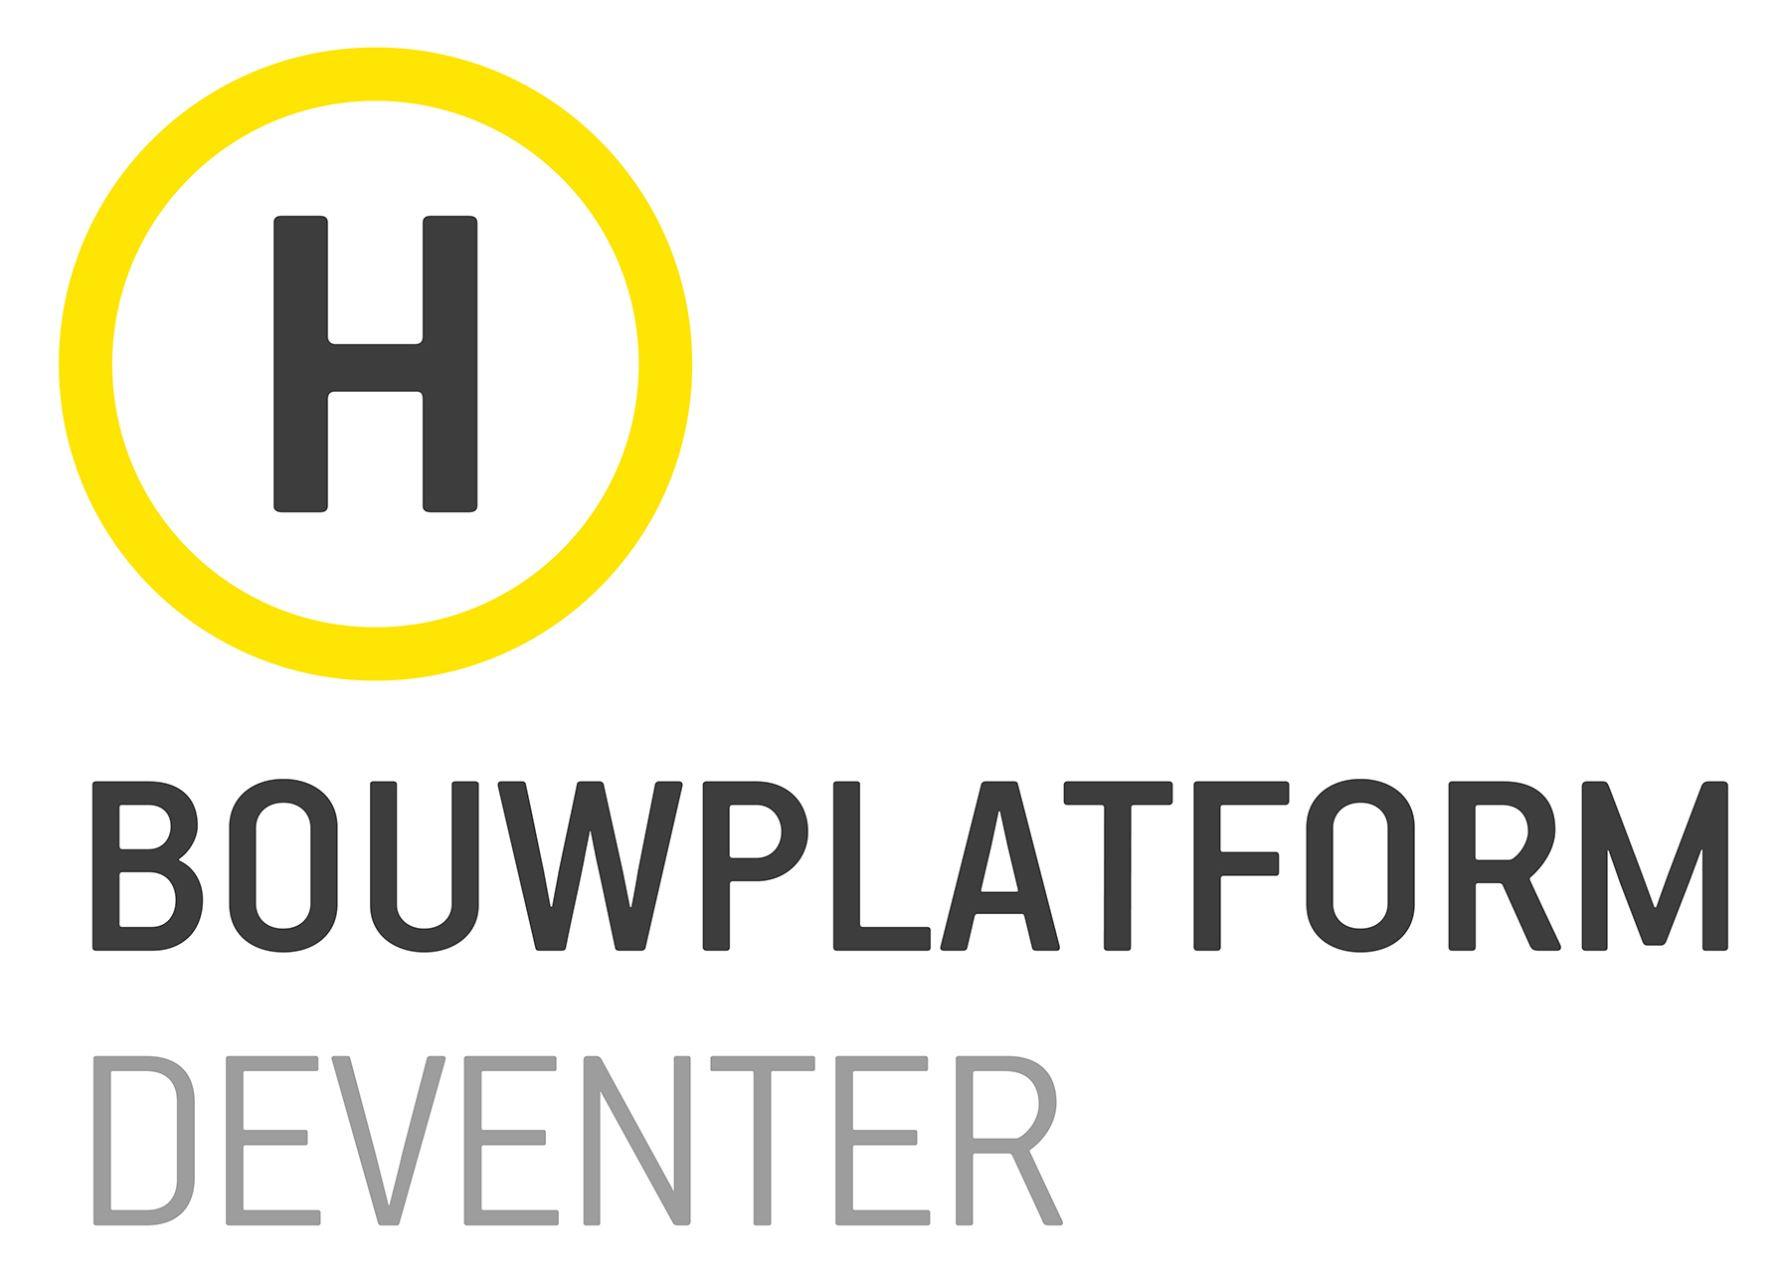 Bouwplatform Deventer